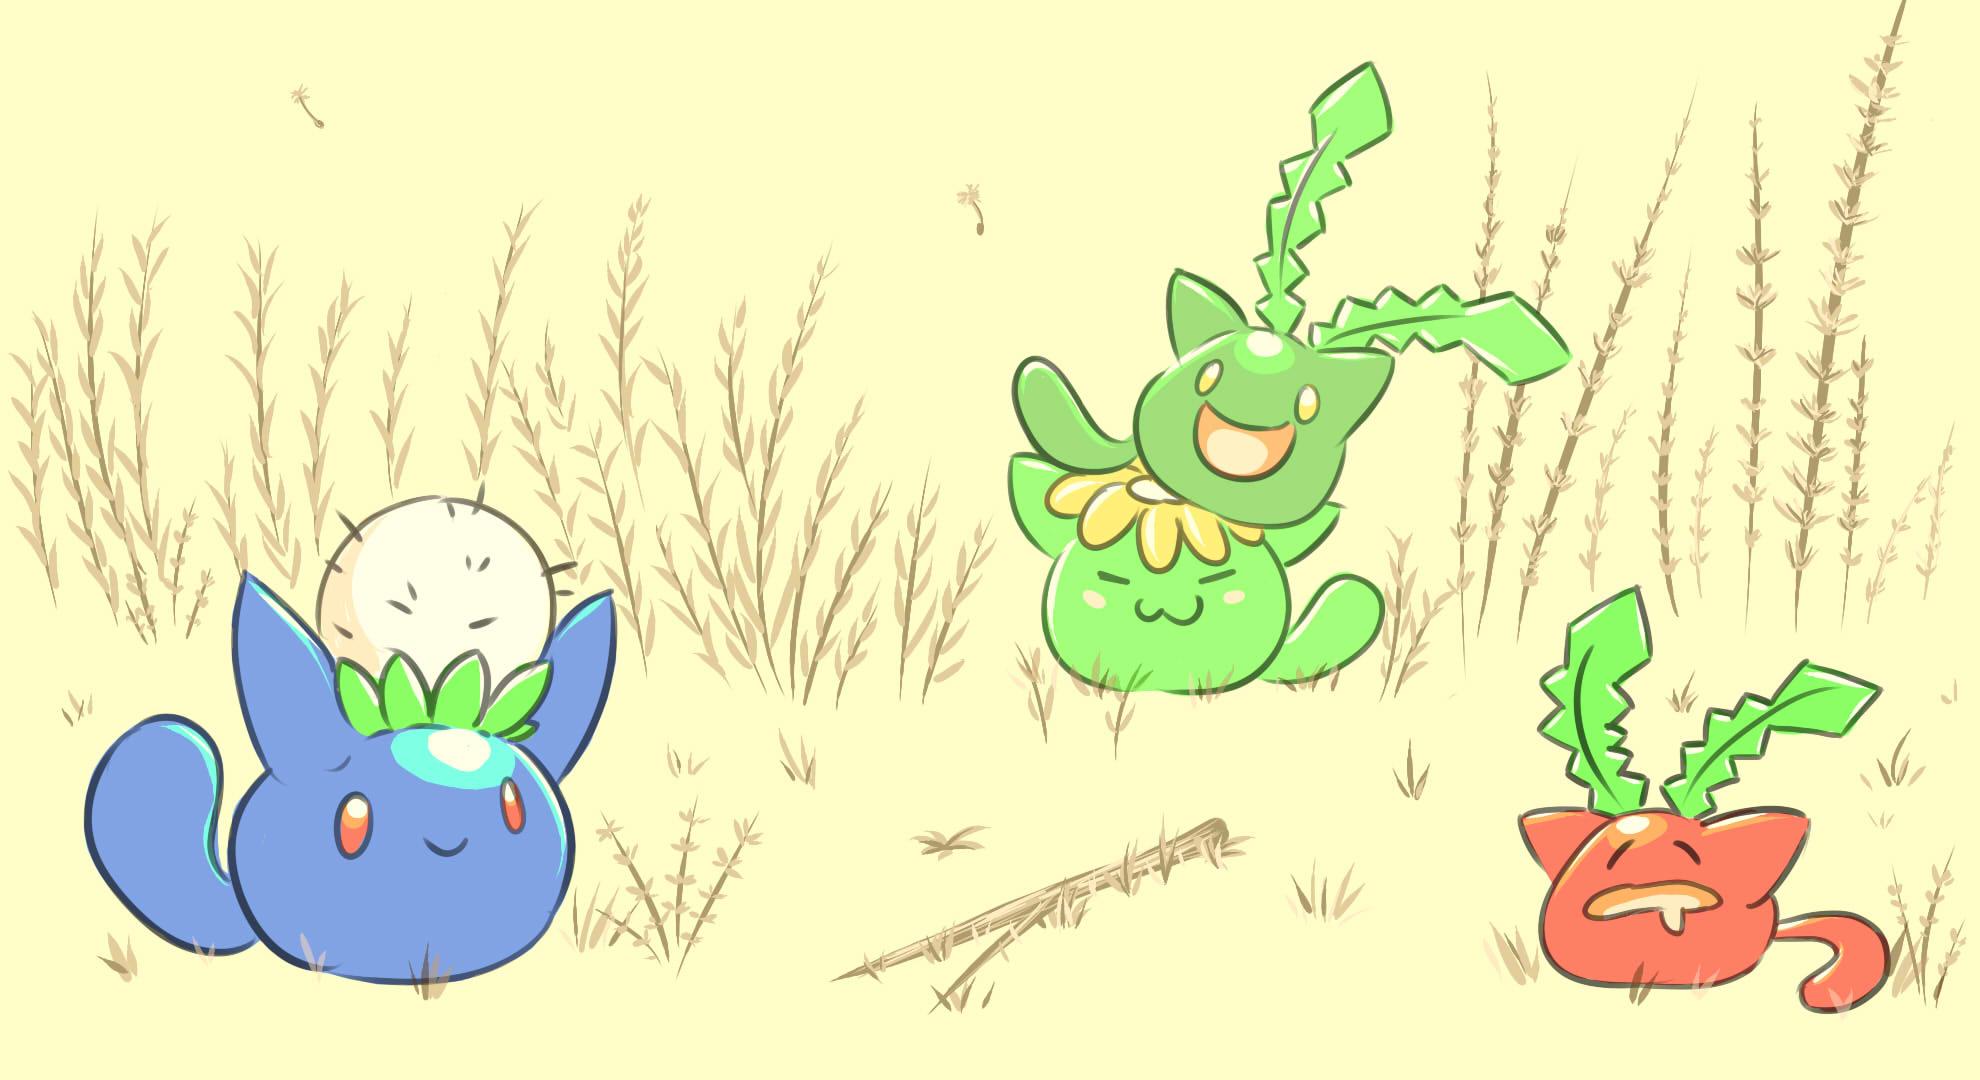 Pokémon-Zeichnung: Beta Hoppspross-Reihe x Slime Rancher